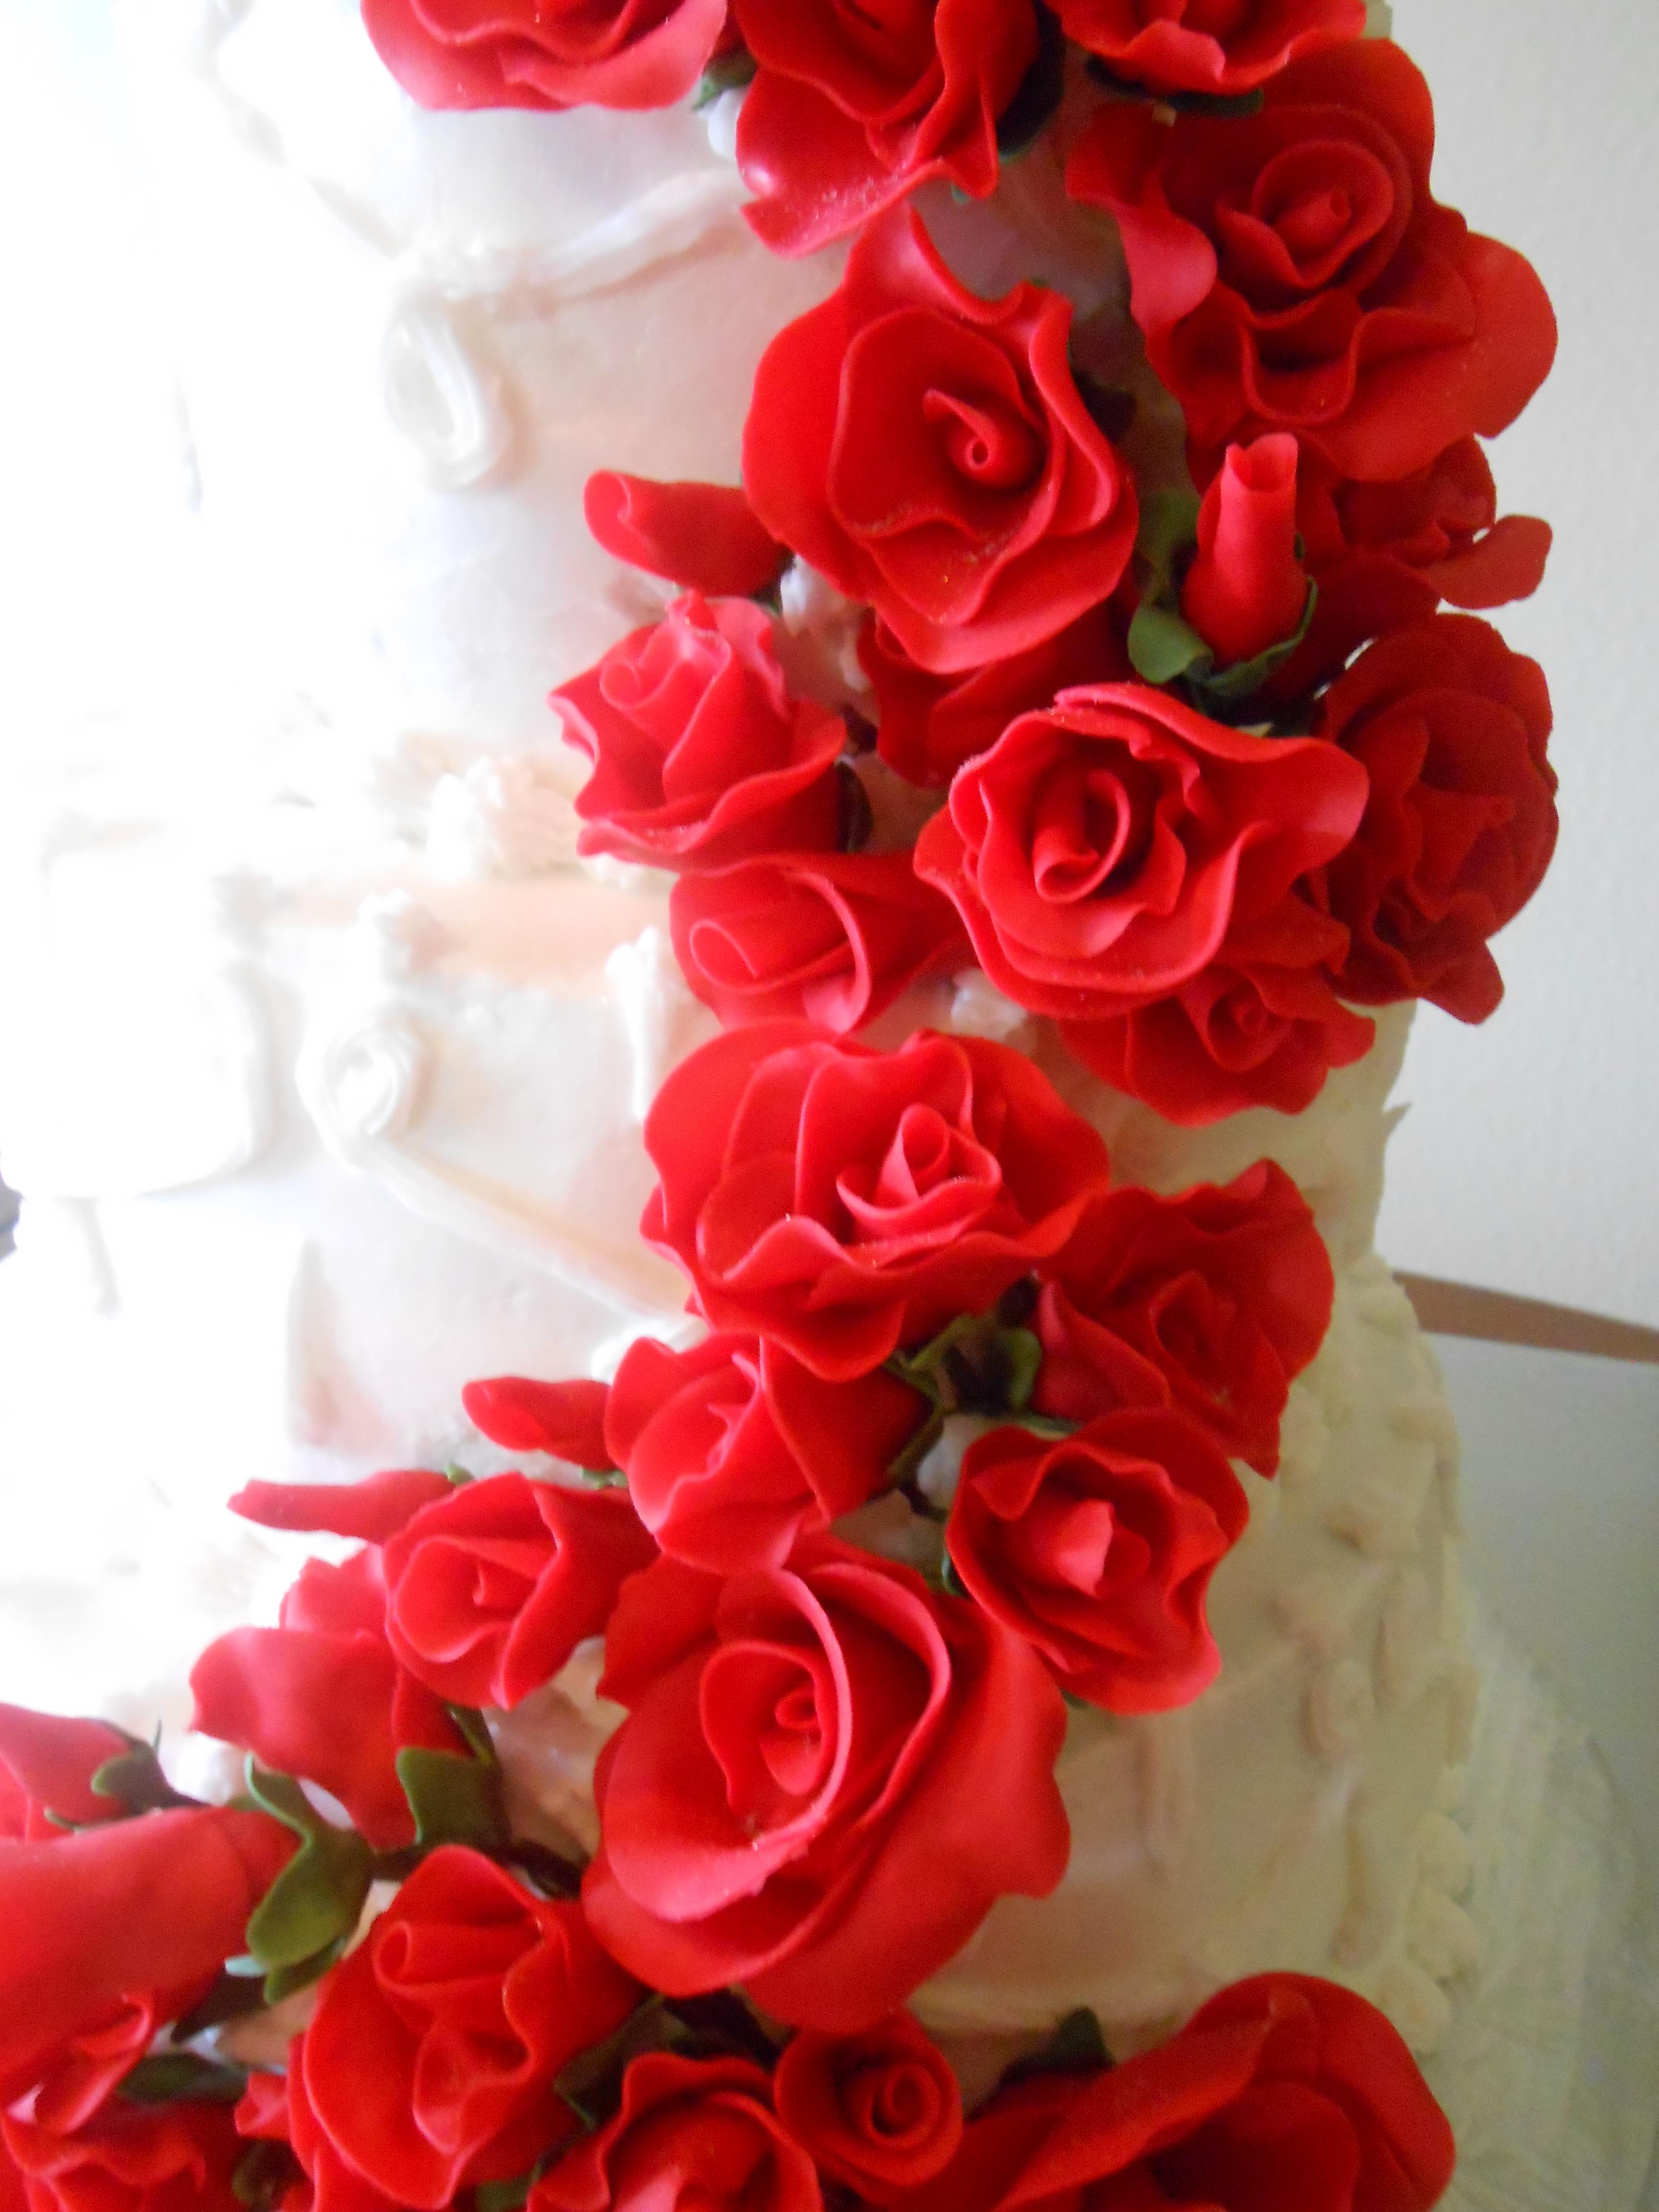 Red Roses Wedding Cake All Fondantgumpaste Roses Cake Was